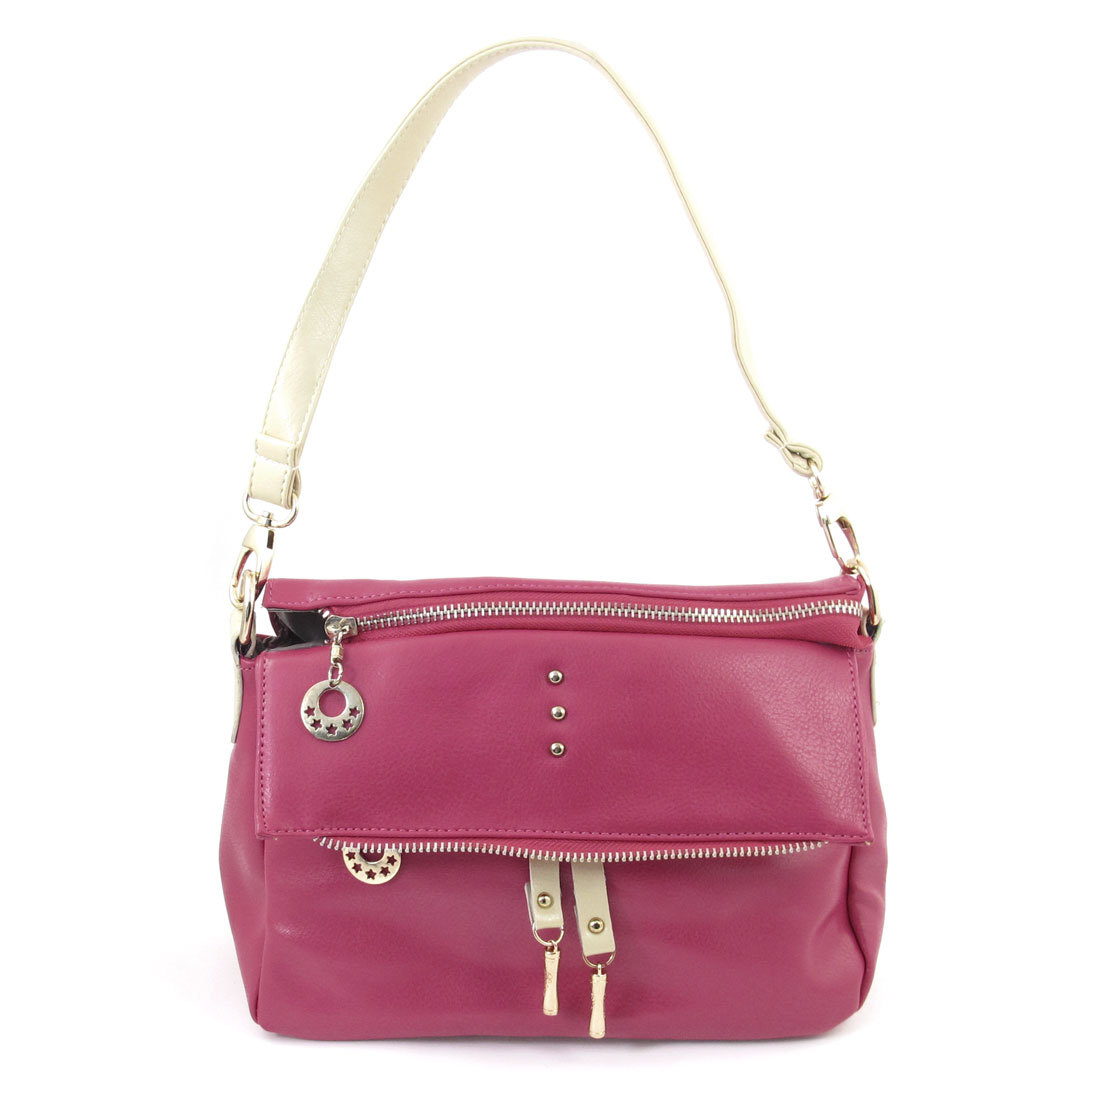 Lady 6 Compartments Zippered Faux Leather Handbag Shoulder Bag Fuchsia